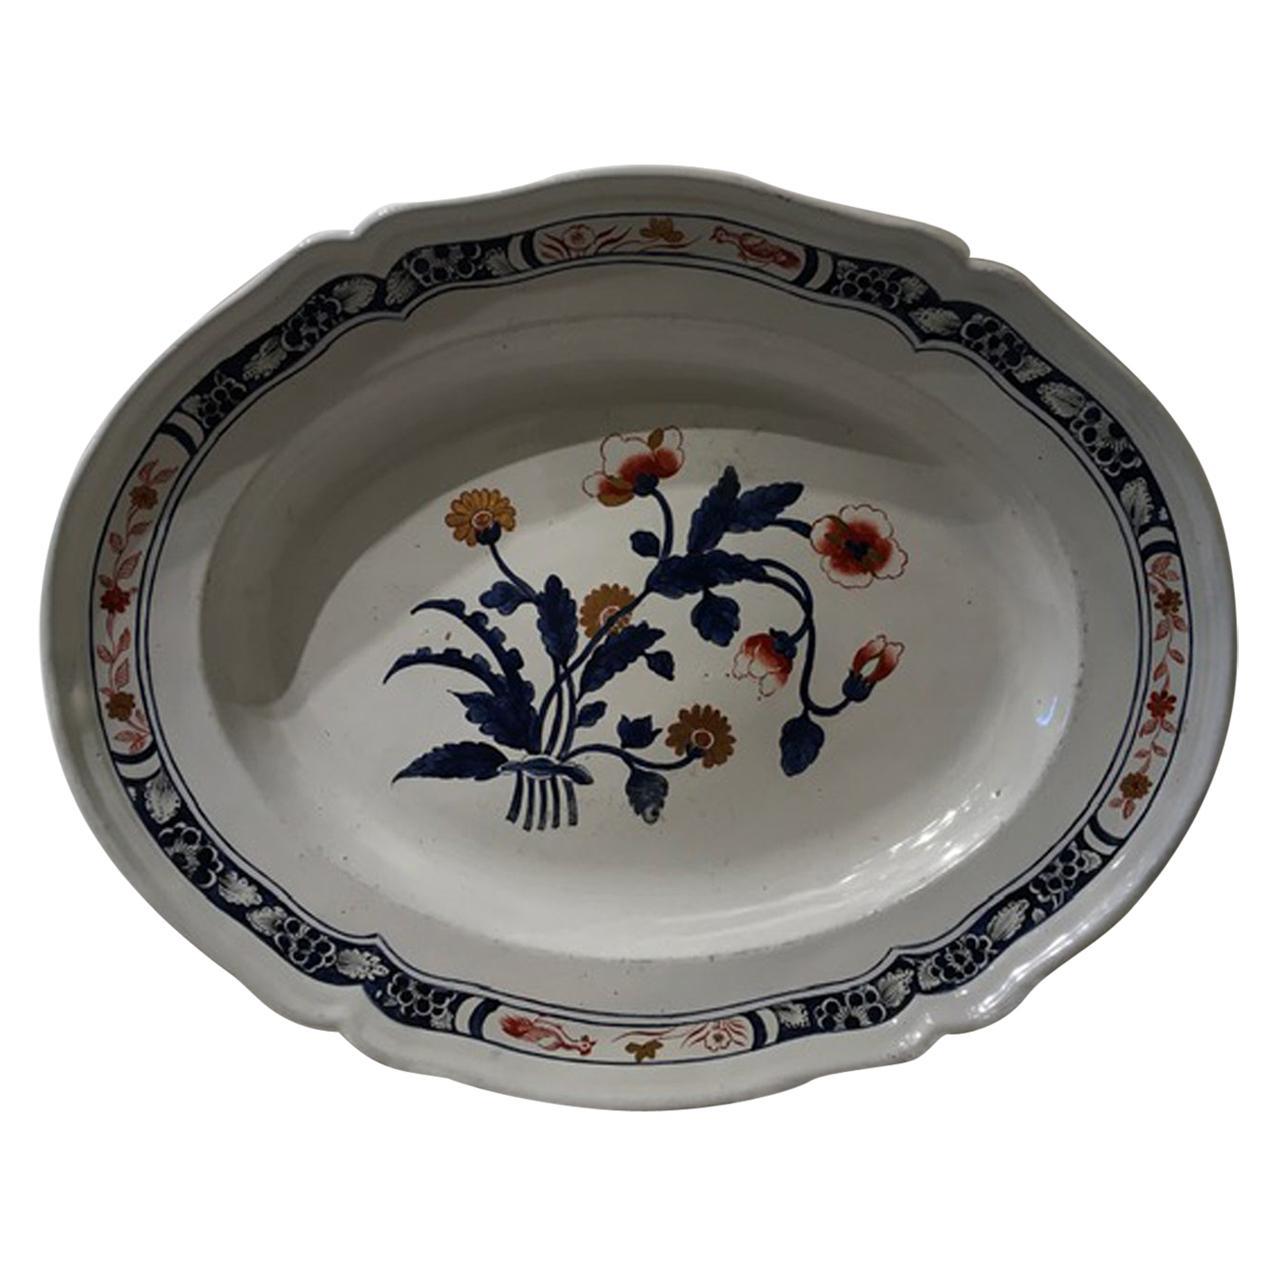 Italy Richard Ginori Doccia Late 18th Century Porcelain Tray Underplate